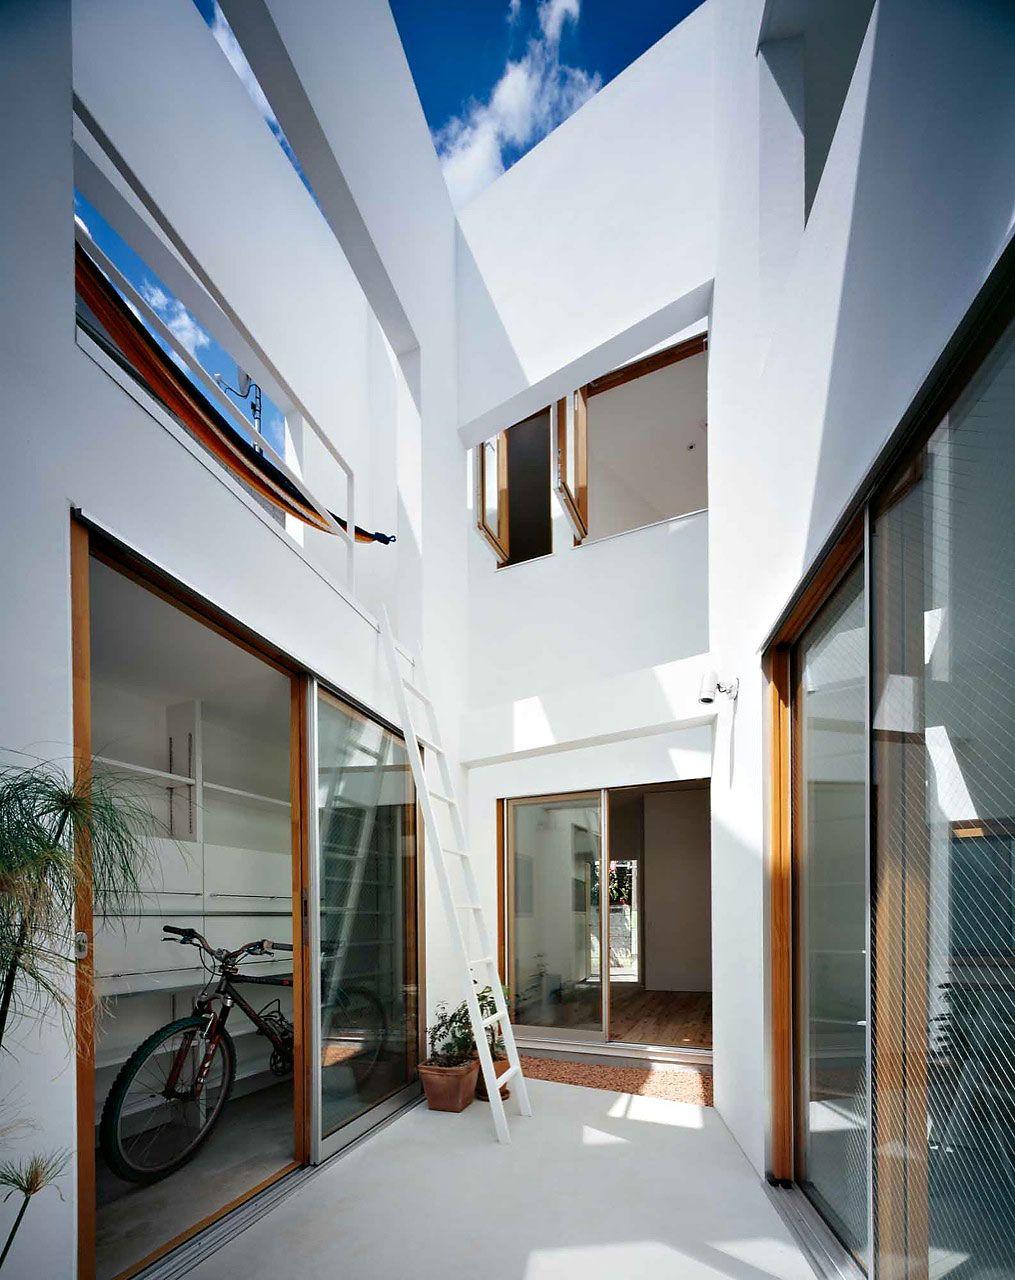 Inside house interiors design interiordecorating white modernarchitecture also rh pinterest